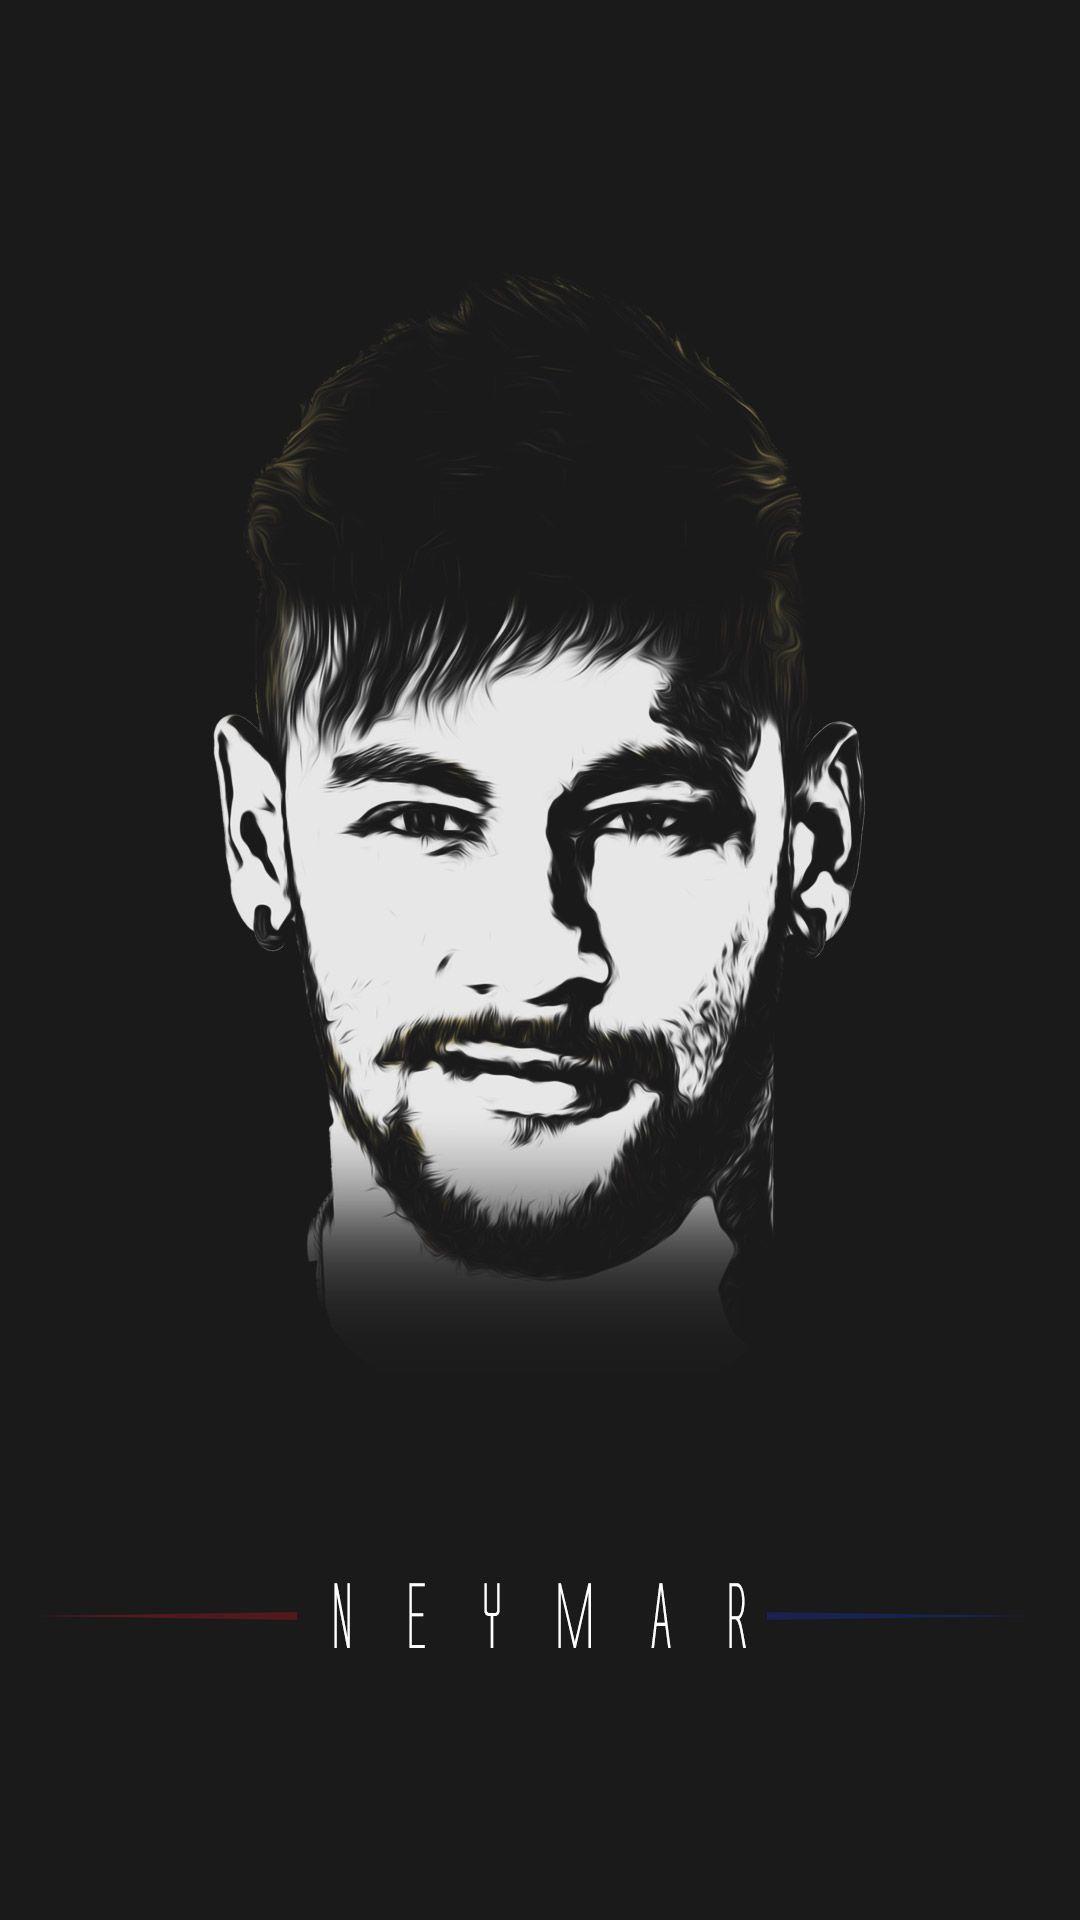 K23designs Neymar Football Neymar Jr Wallpapers Neymar Jr